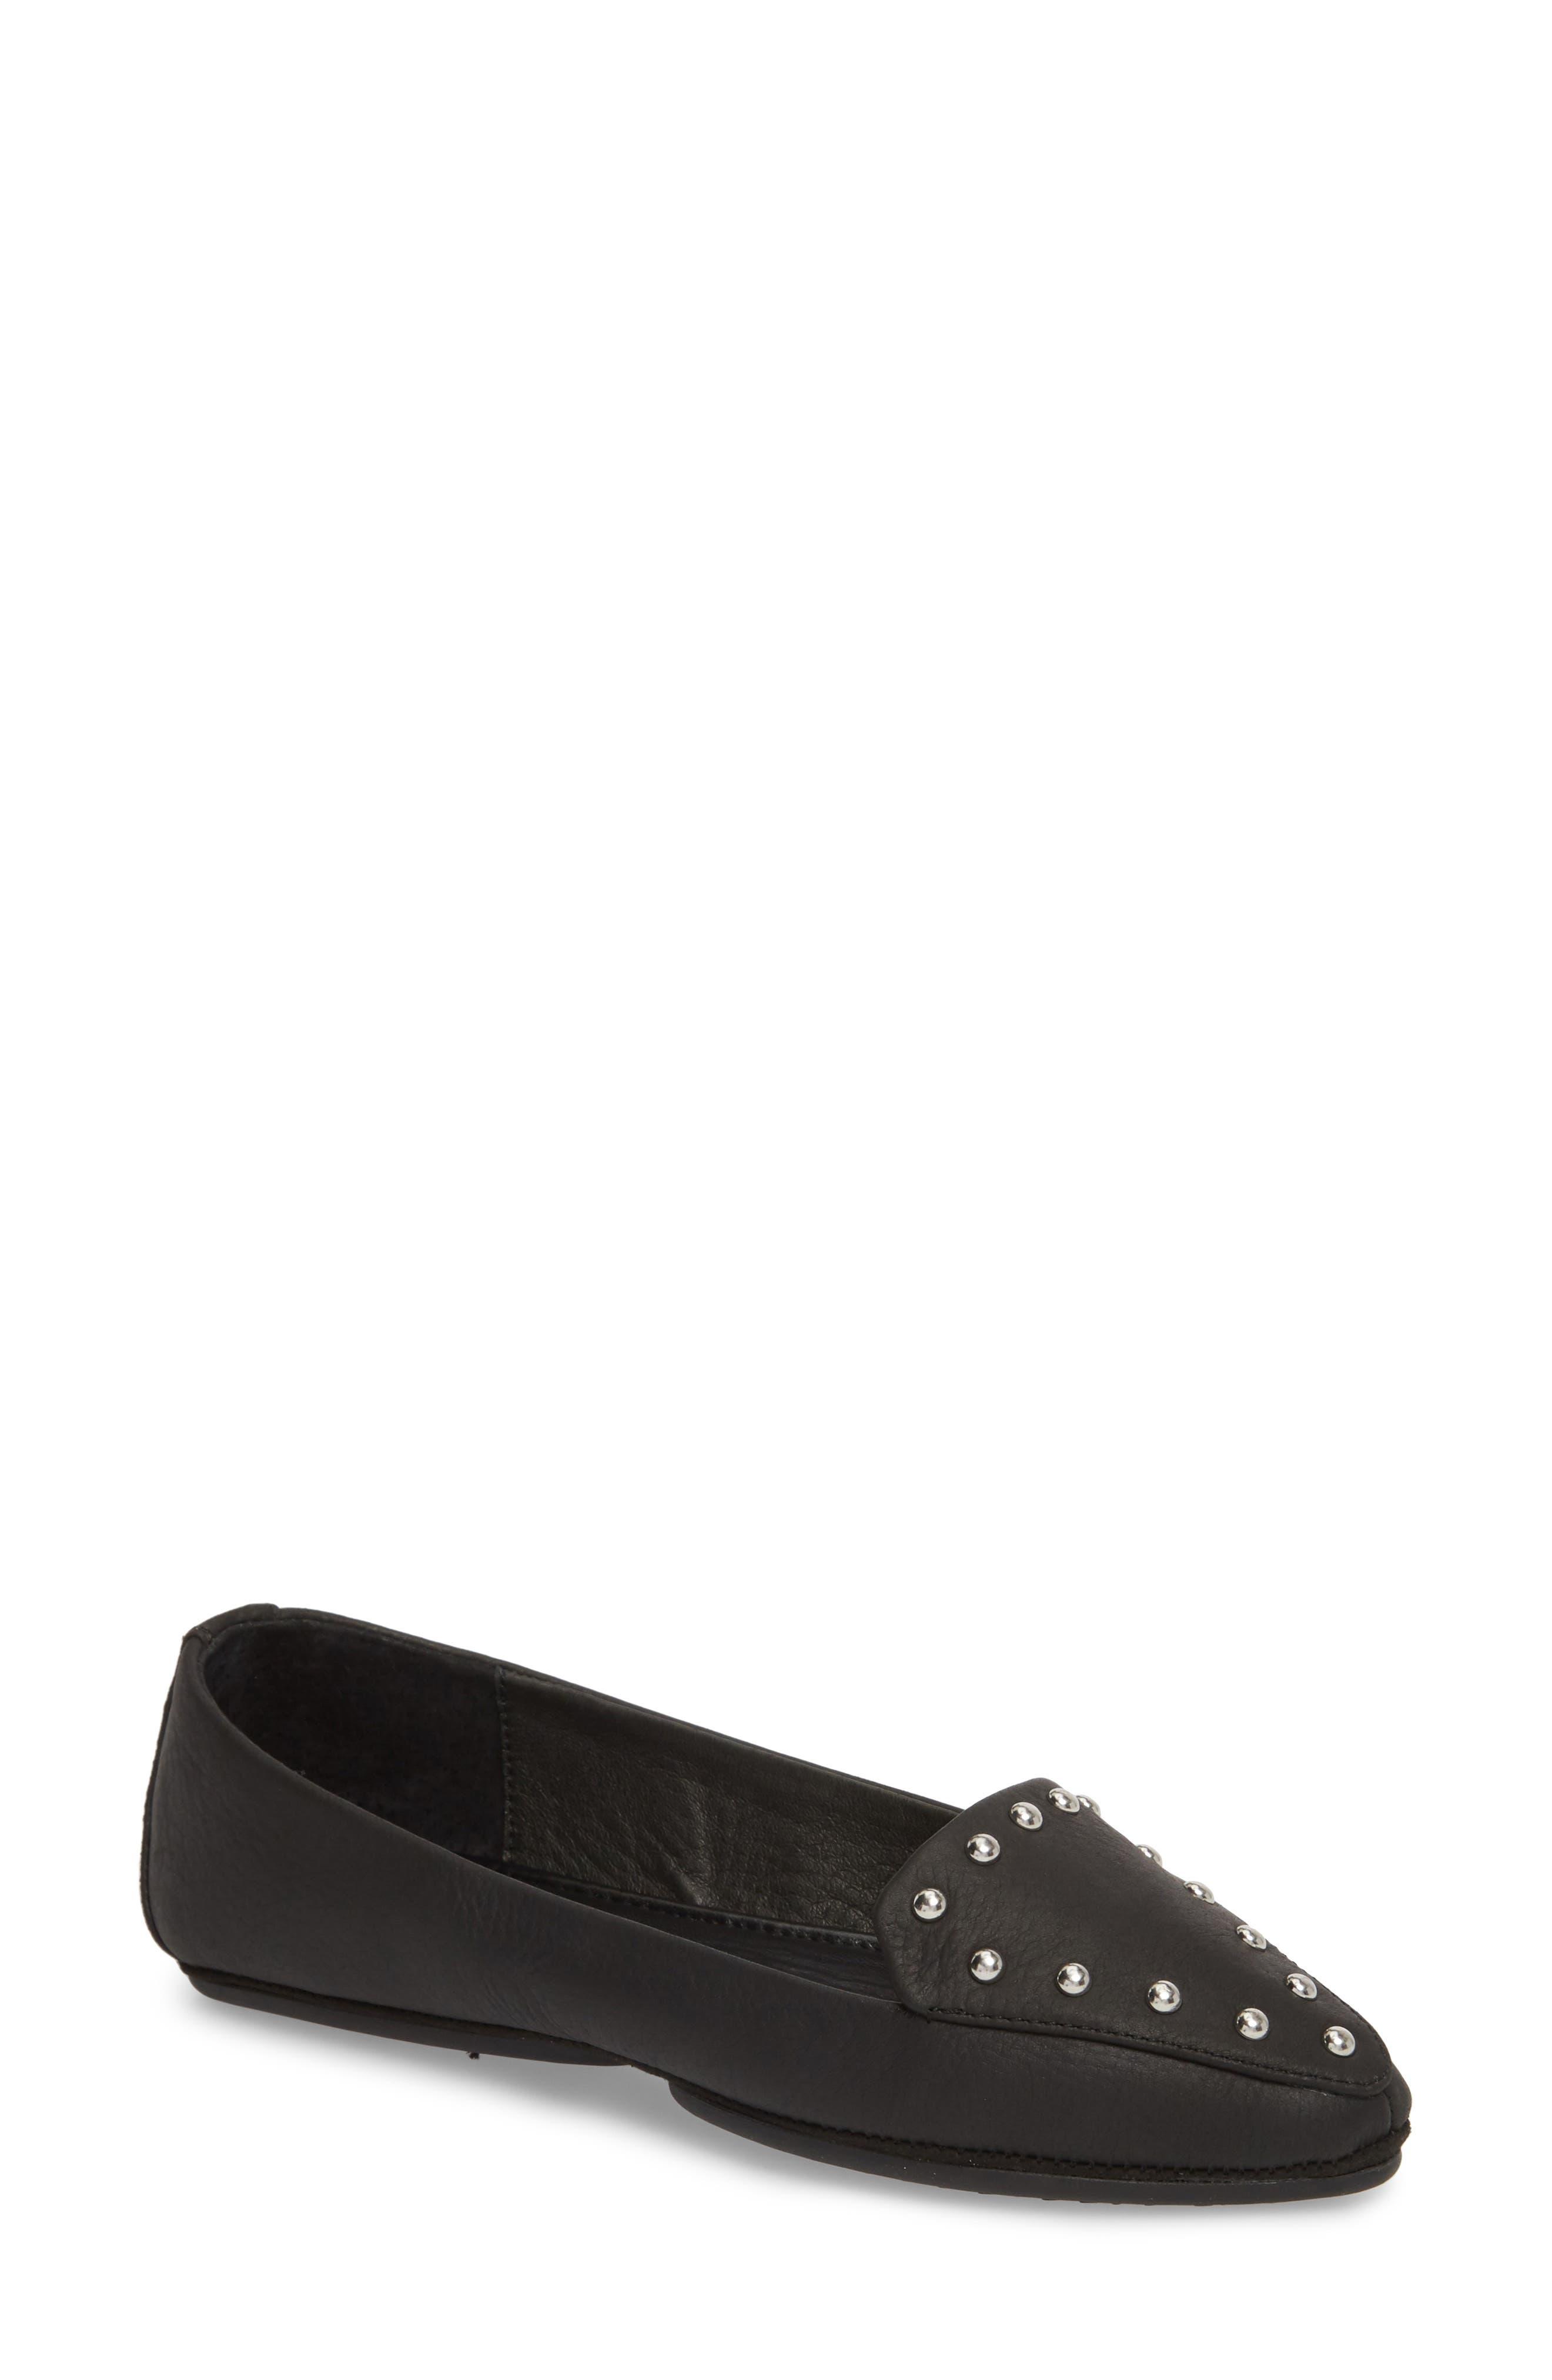 Vera Loafer,                             Main thumbnail 1, color,                             Black Stud Leather